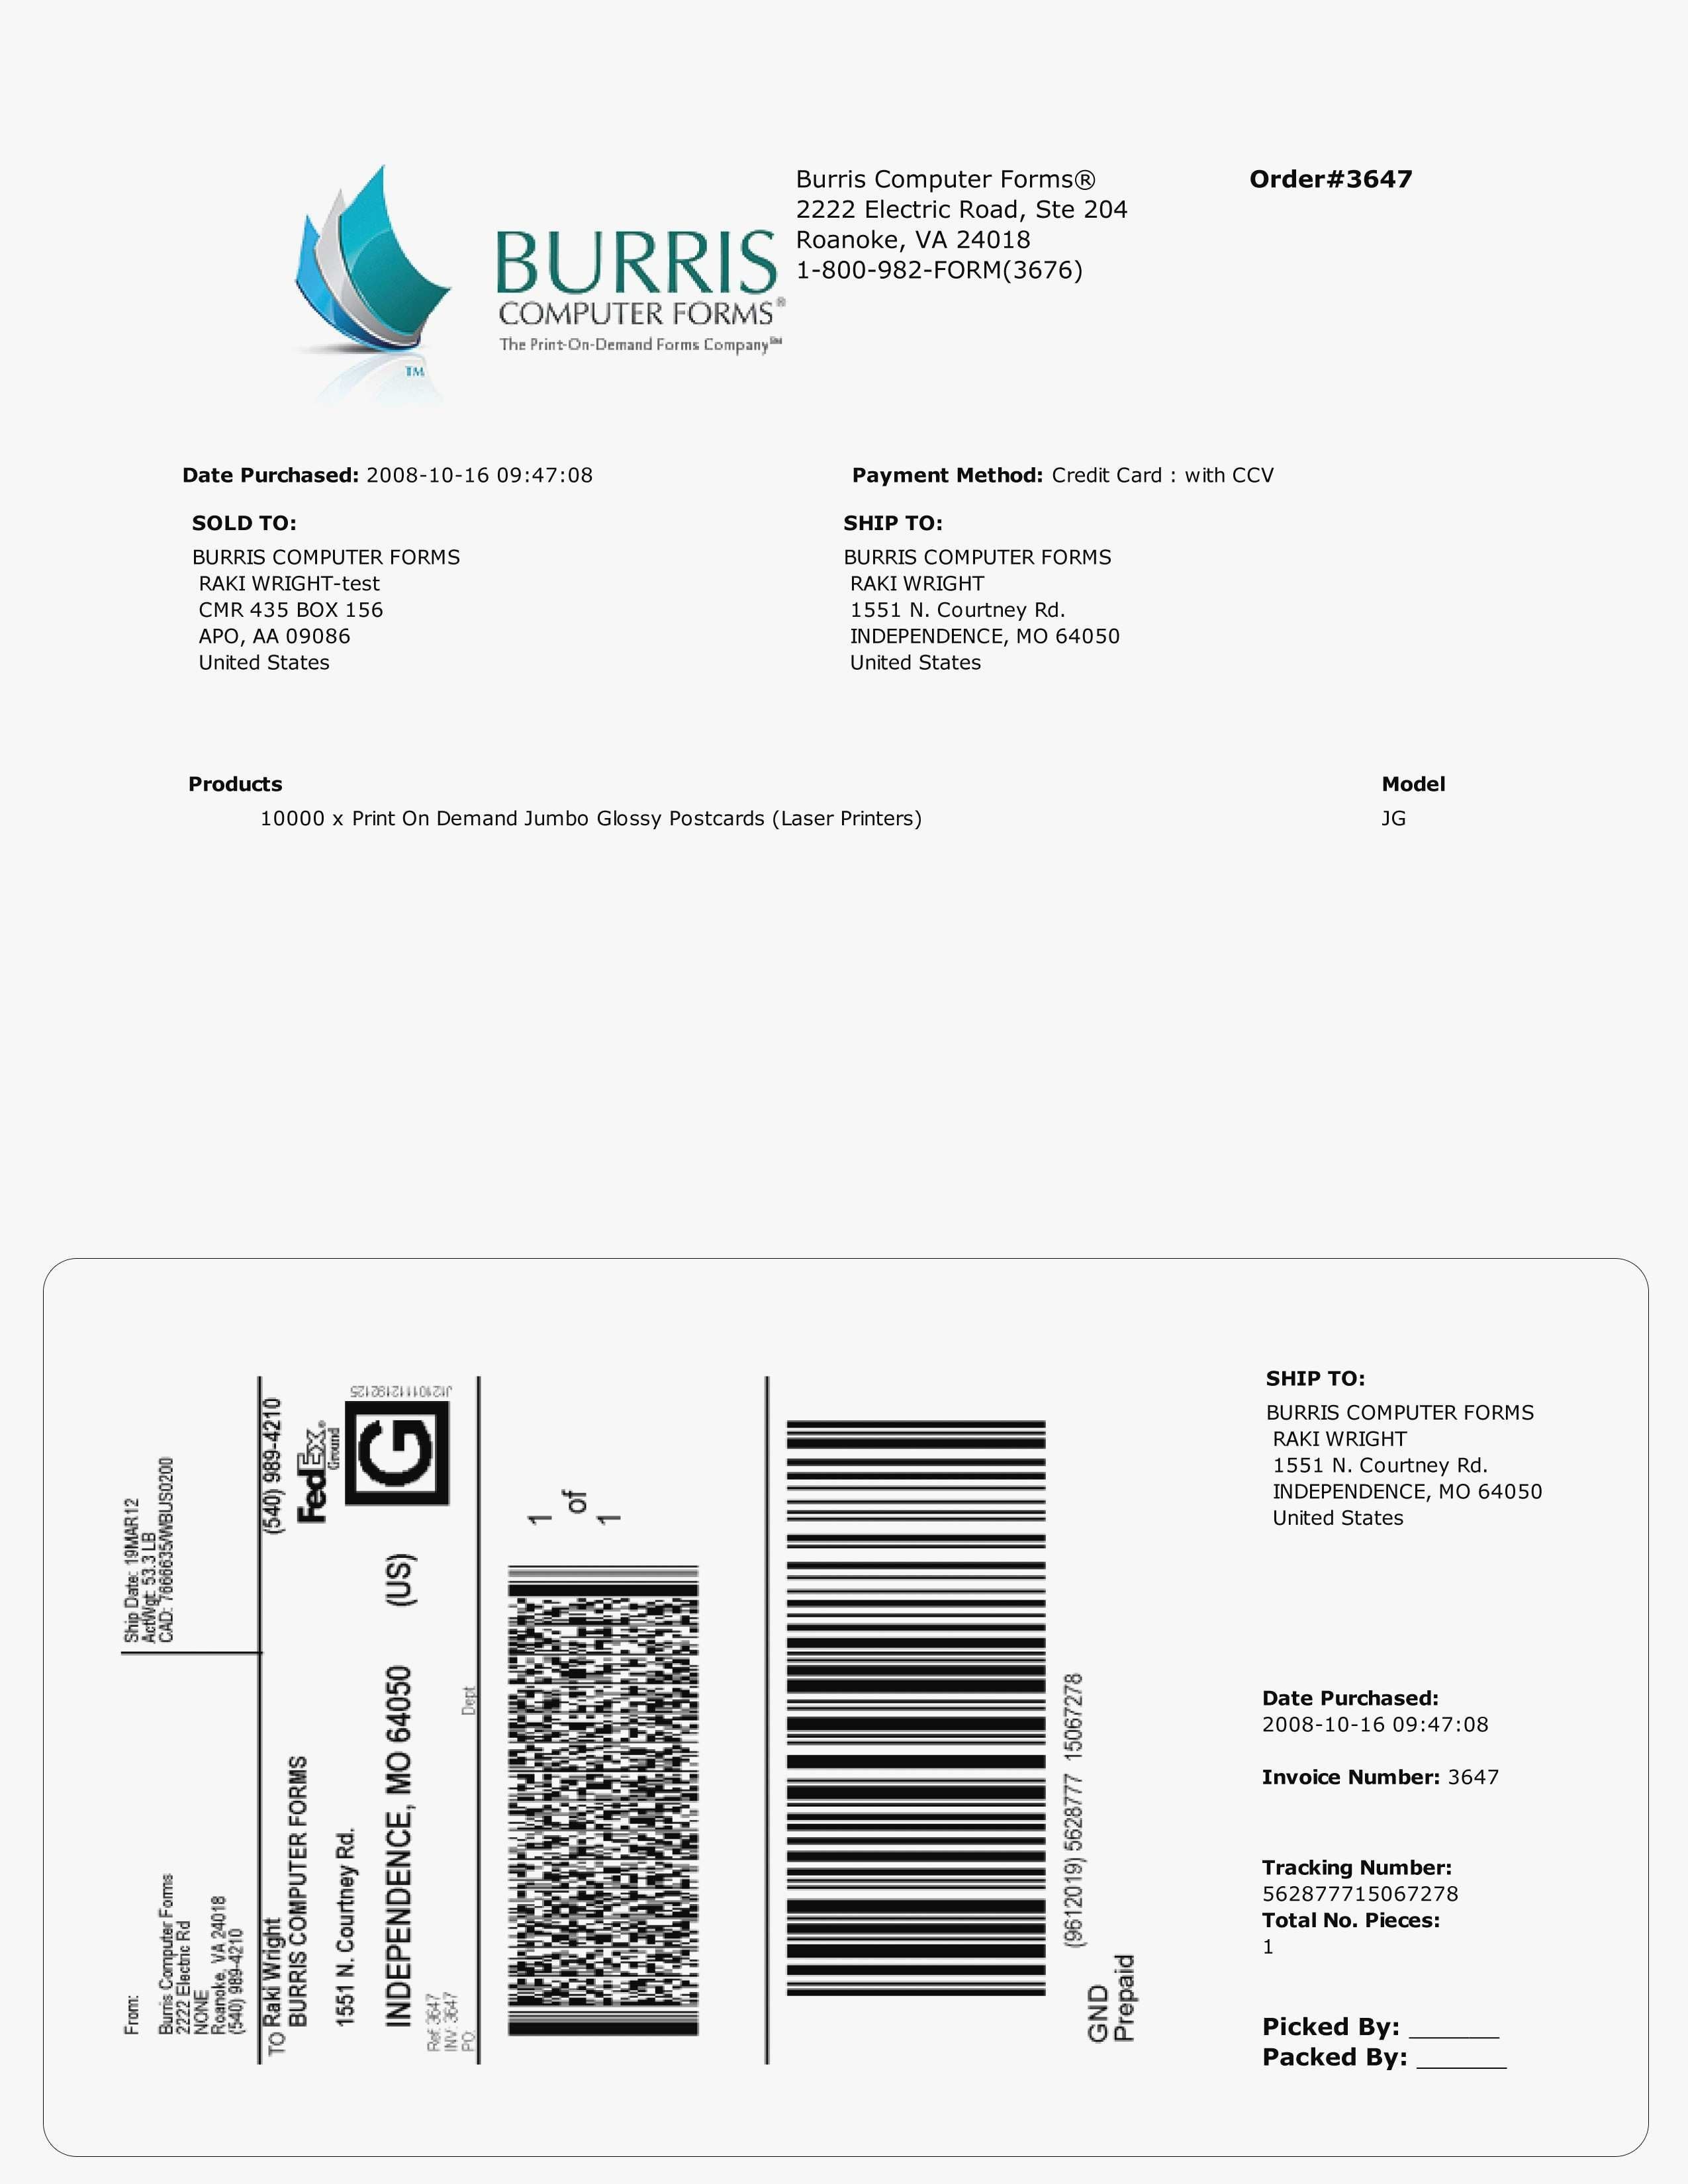 New Fedex Print Shipping Label - Acilmalumat - Free Printable Shipping Labels